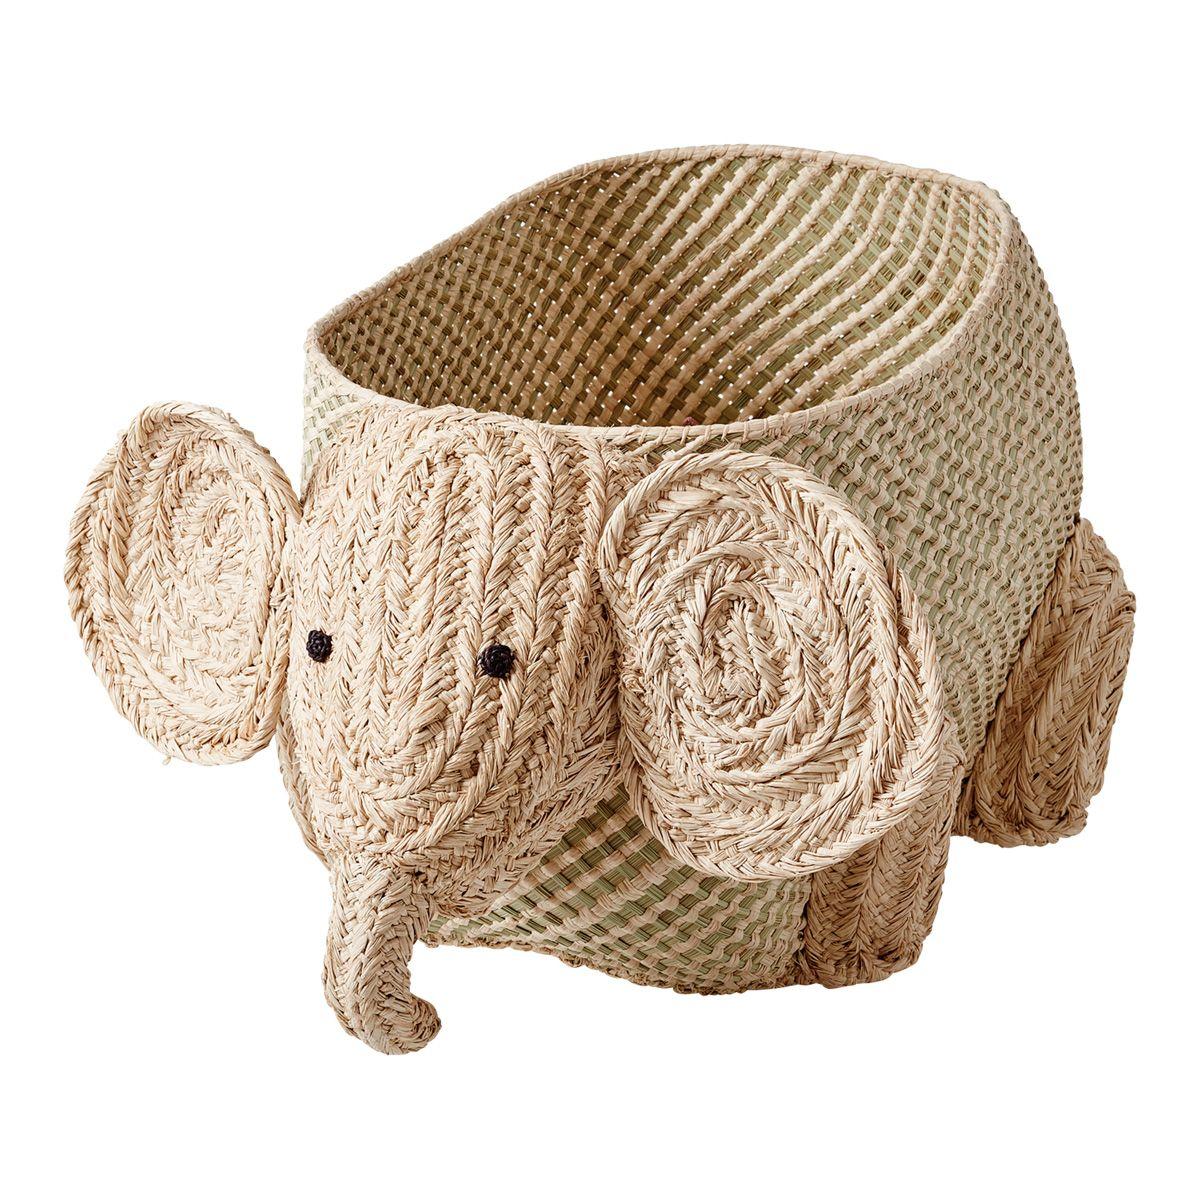 Rice - Woven Storage Animal - Elephant